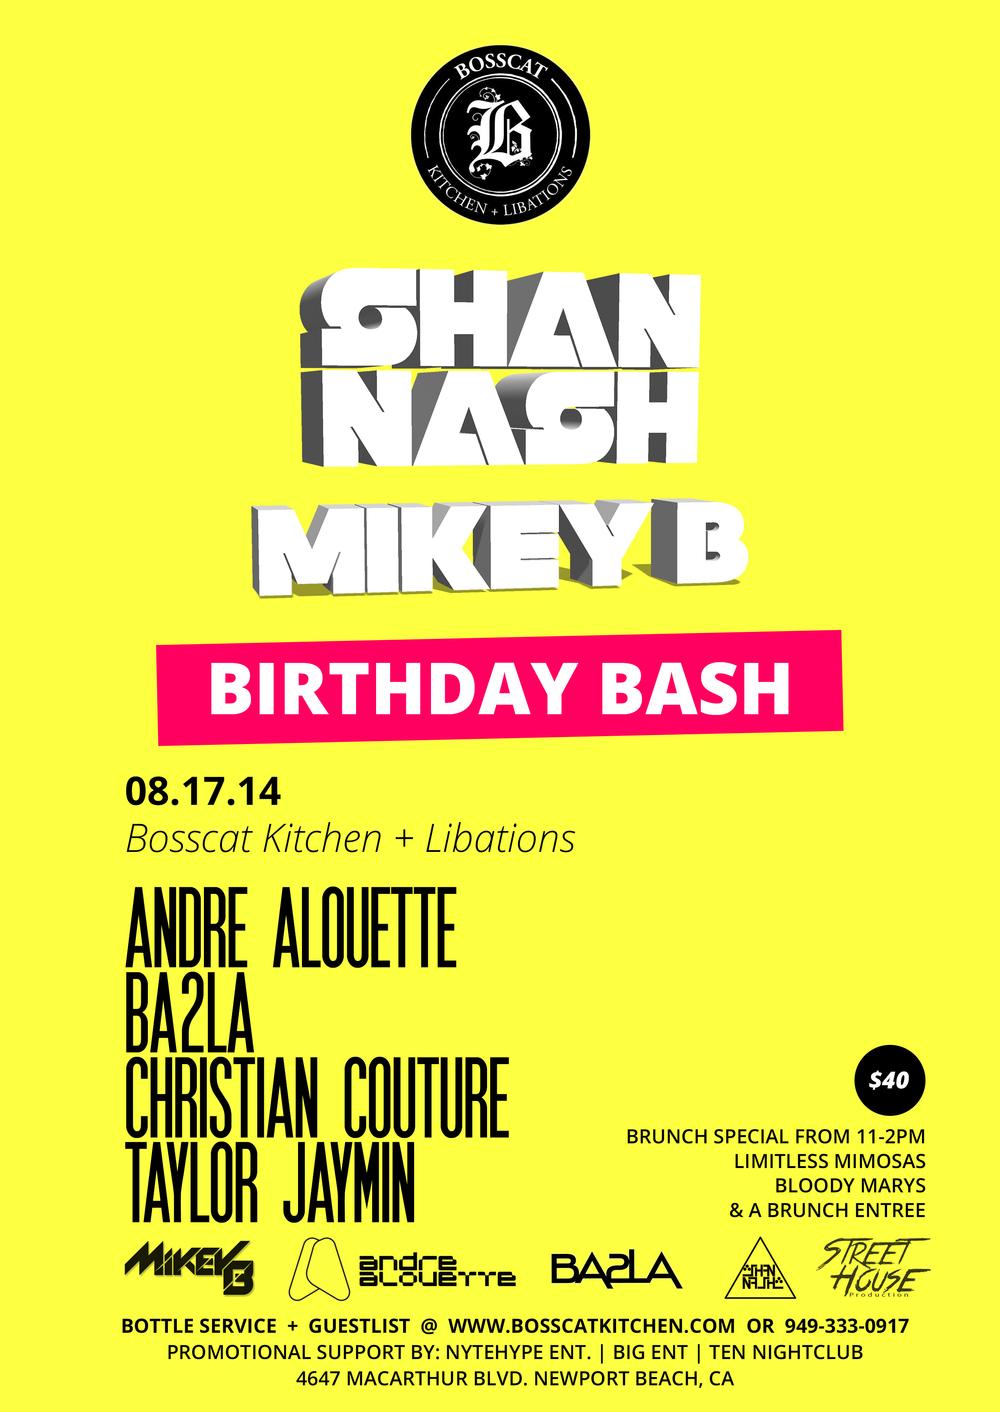 8-17-2014 Bosscat Shan Nash & Mike B Flyer.jpg